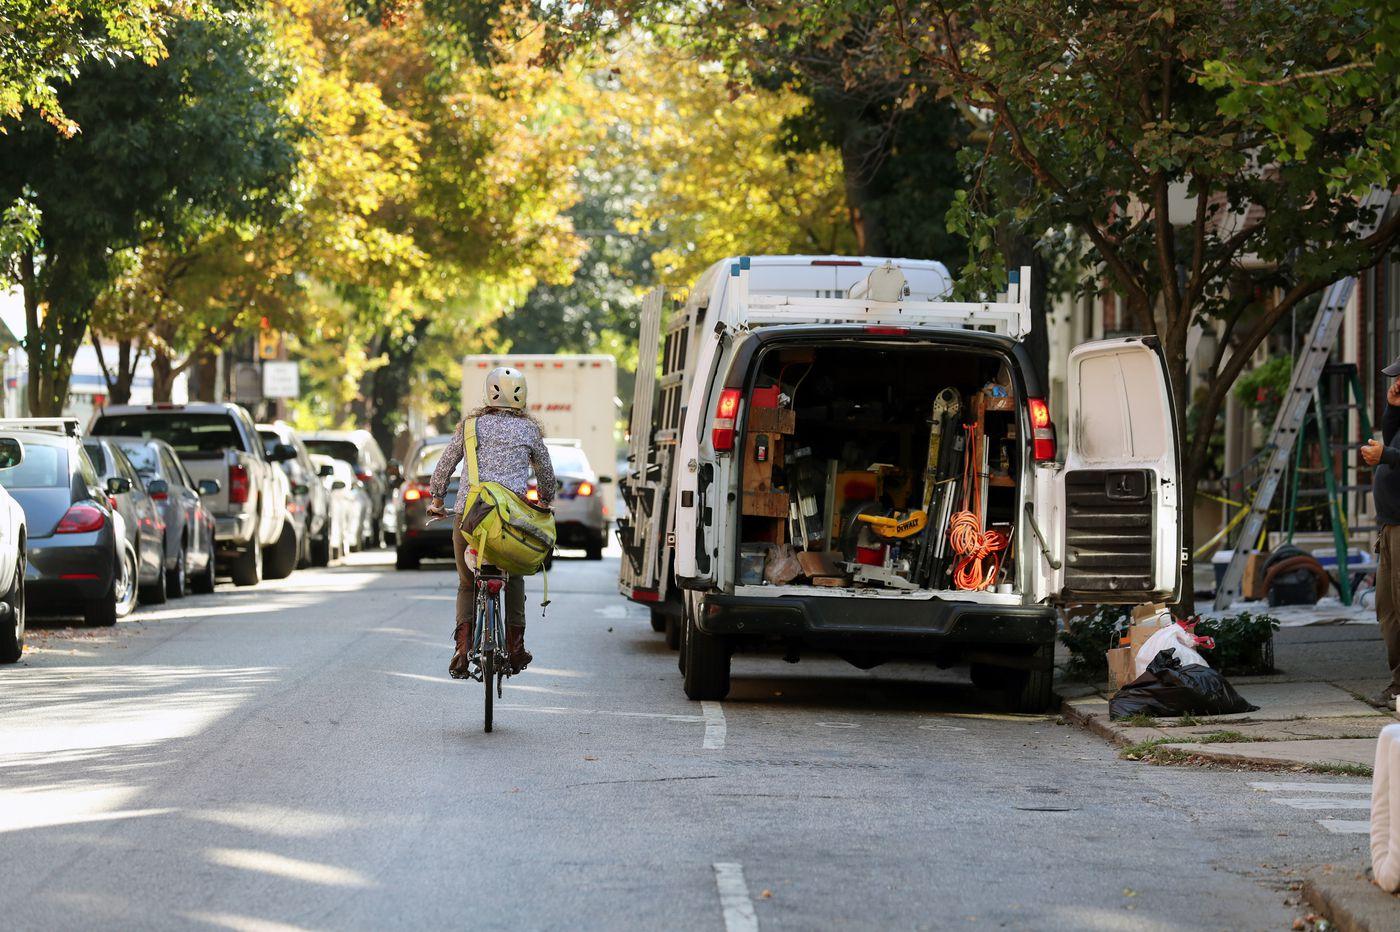 Police enforcement up on motorists, down on cyclists, pedestrians, potheads, skateboarders | Stu Bykofsky